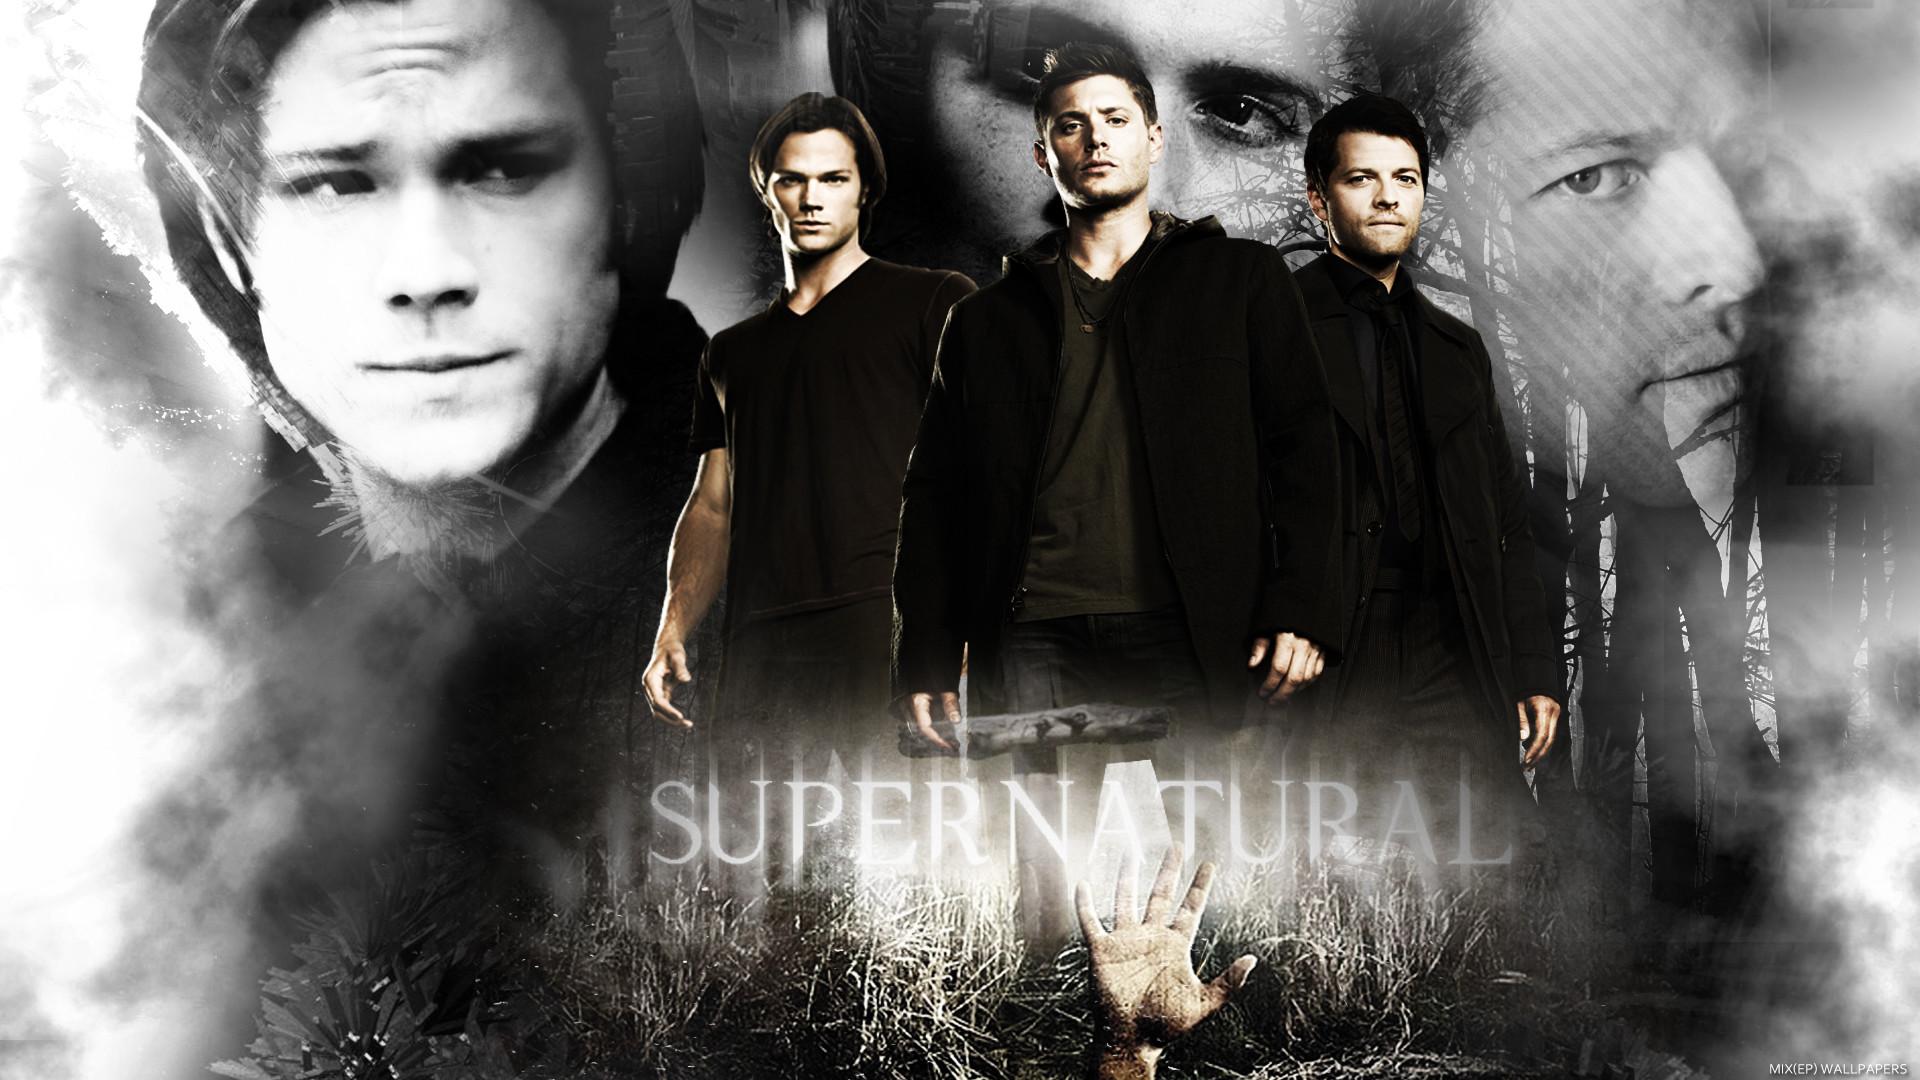 Supernatural wallpaper – Supernatural Wallpaper (33561497) – Fanpop